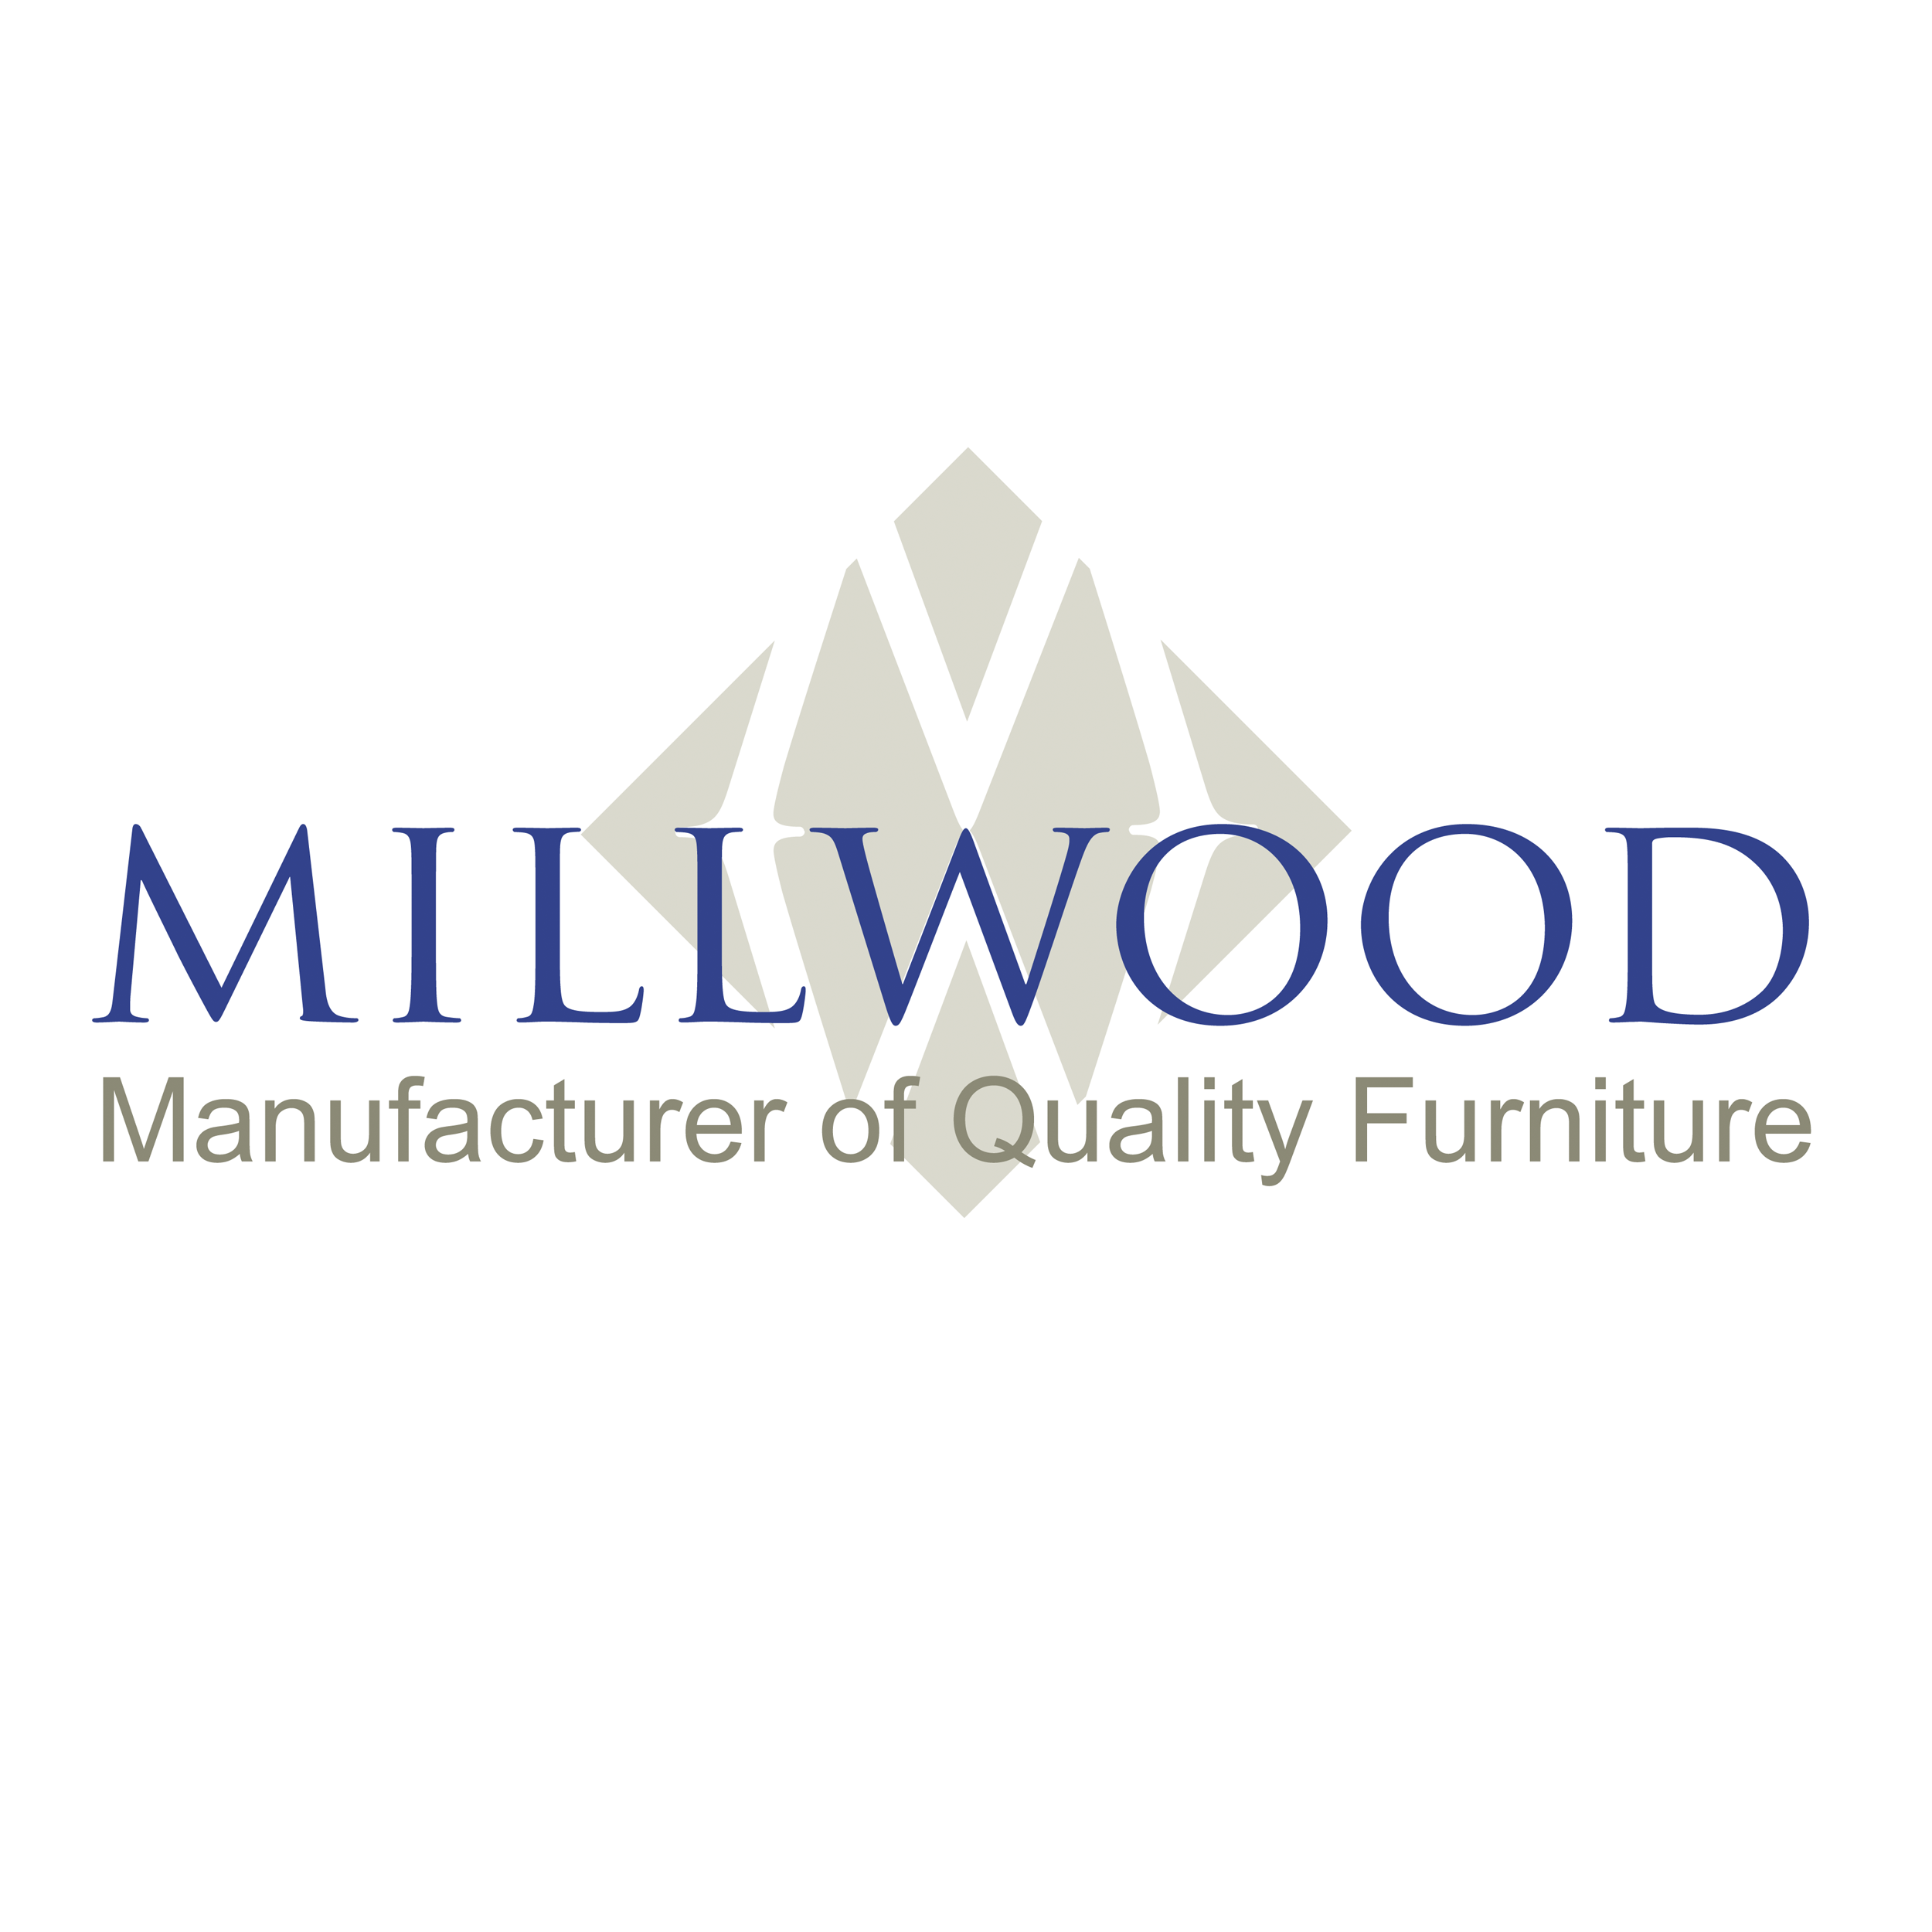 Furniture logo samples company logo design millwood furniture furniture logo samples company logo design millwood furniture samples i thecheapjerseys Image collections